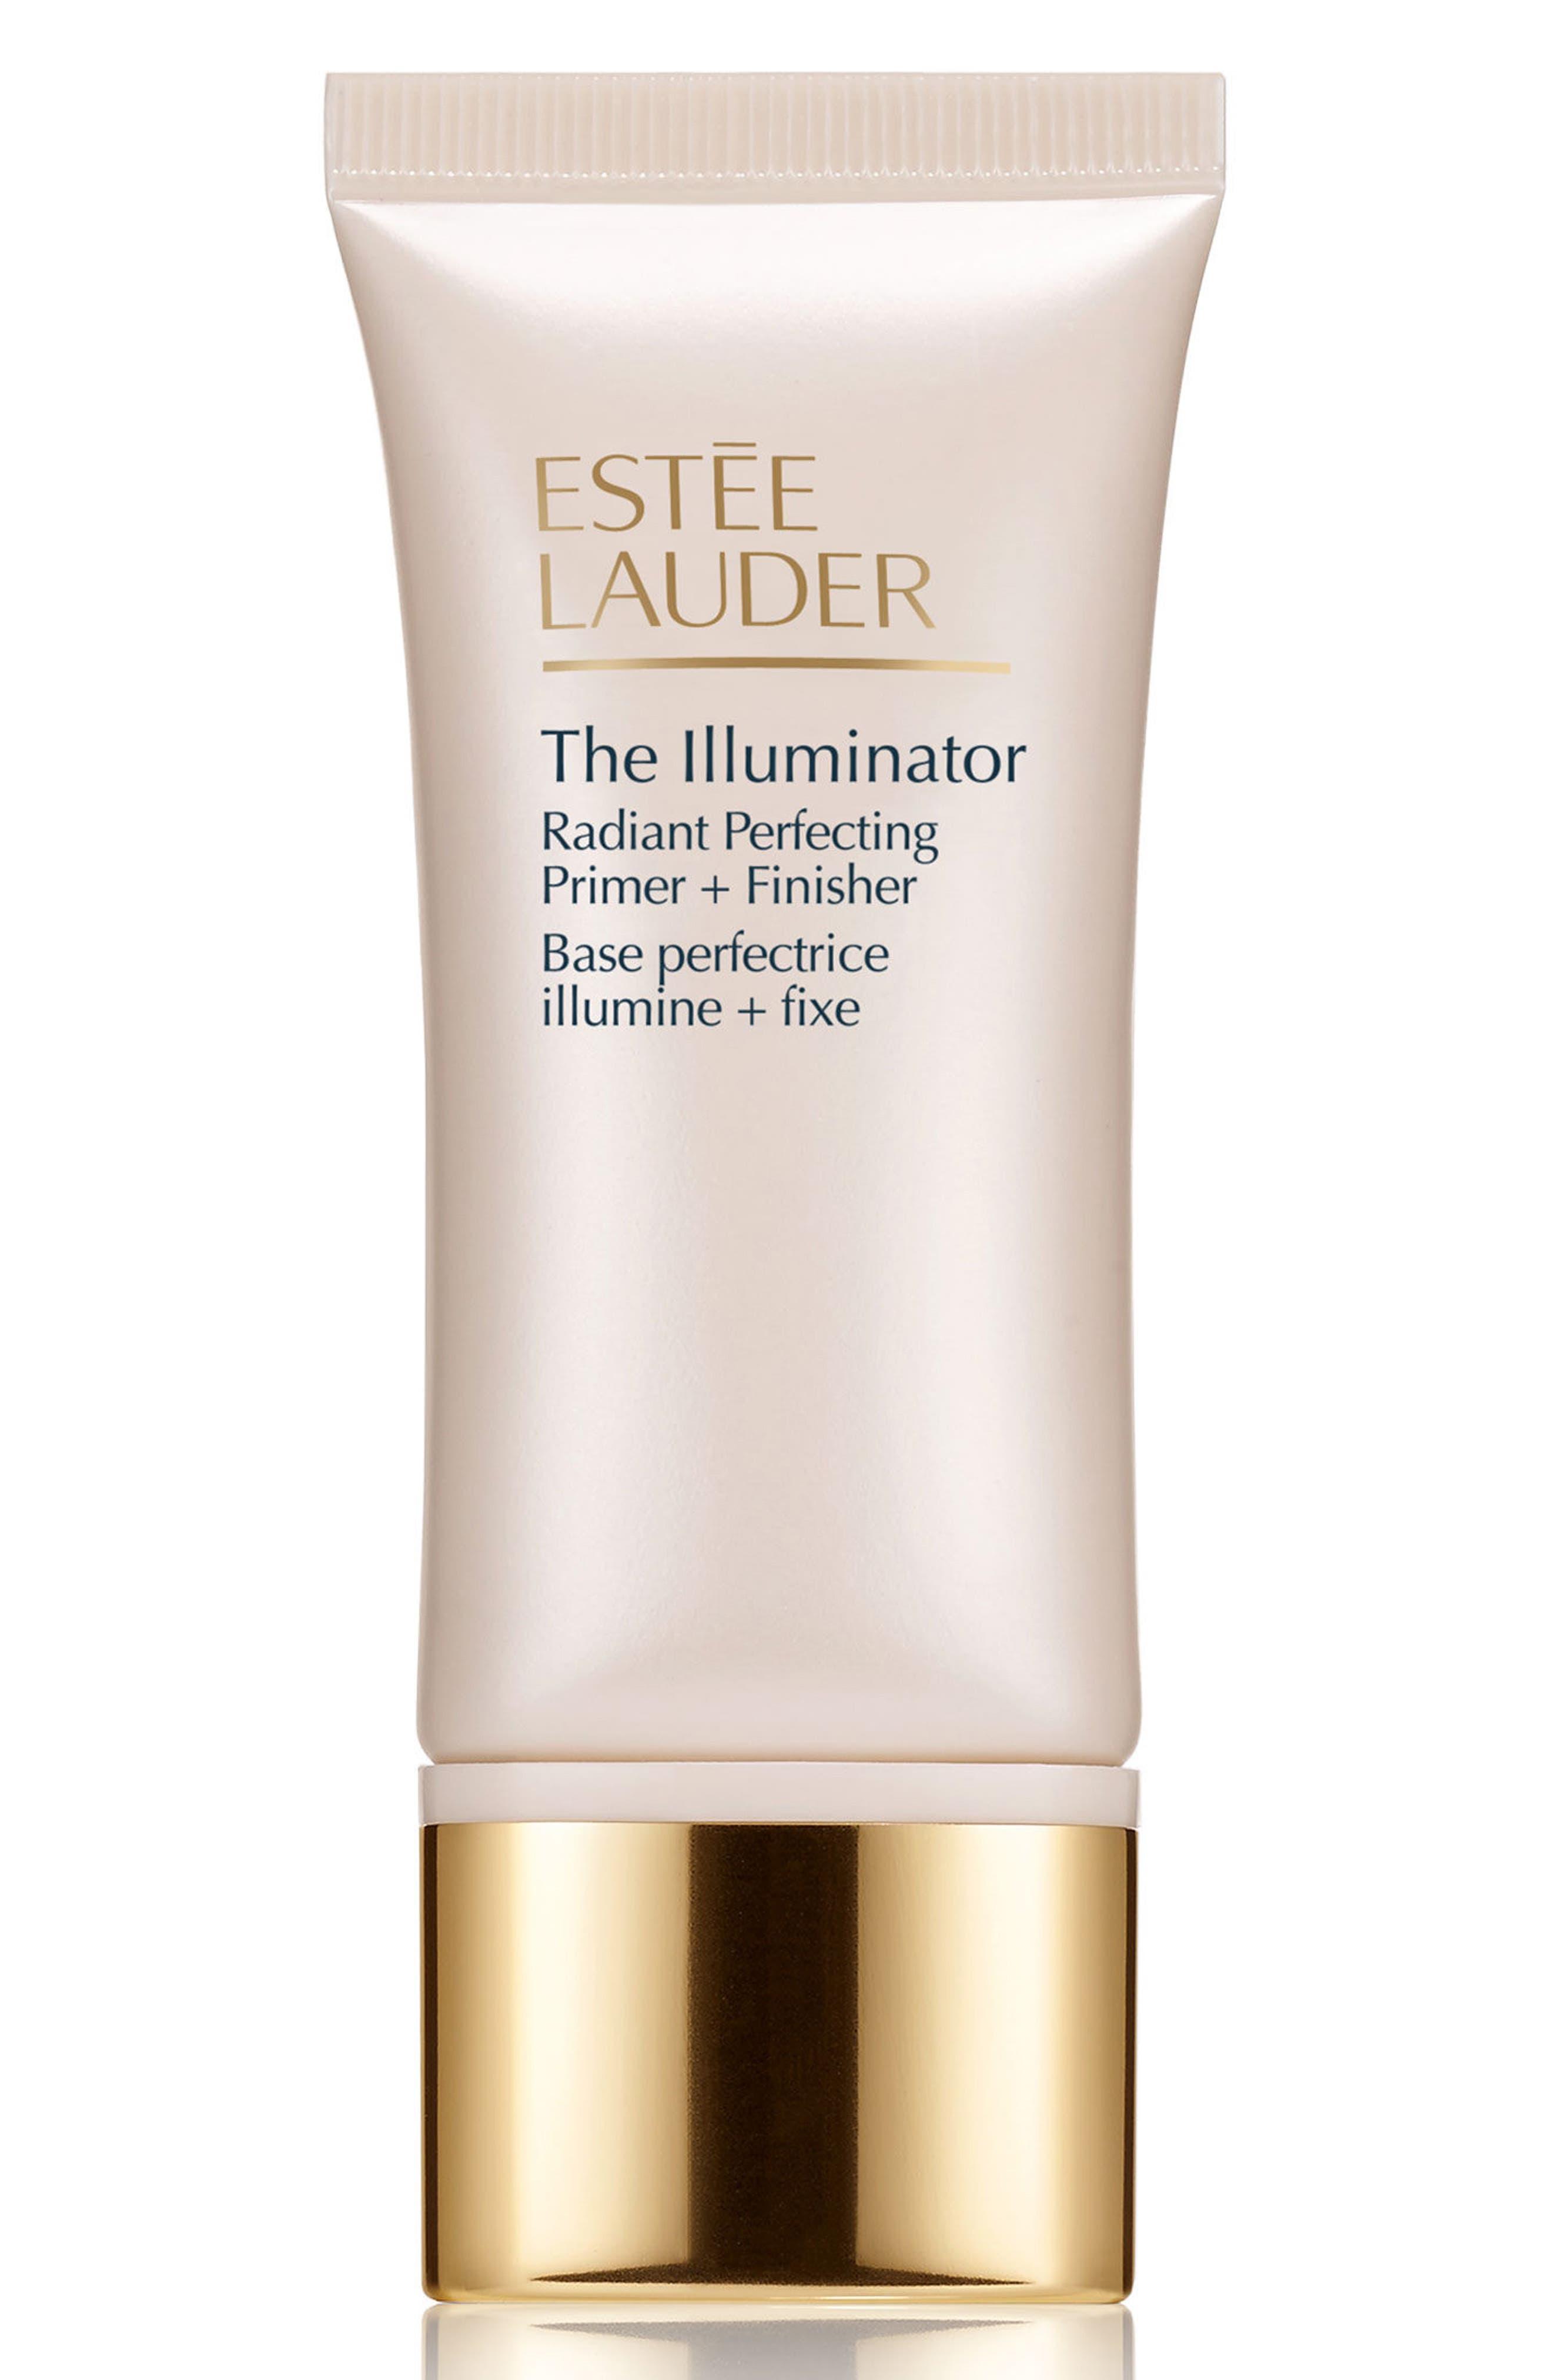 ESTÉE LAUDER The Illuminator Radiant Perfecting Primer + Finisher, Main, color, NO COLOR